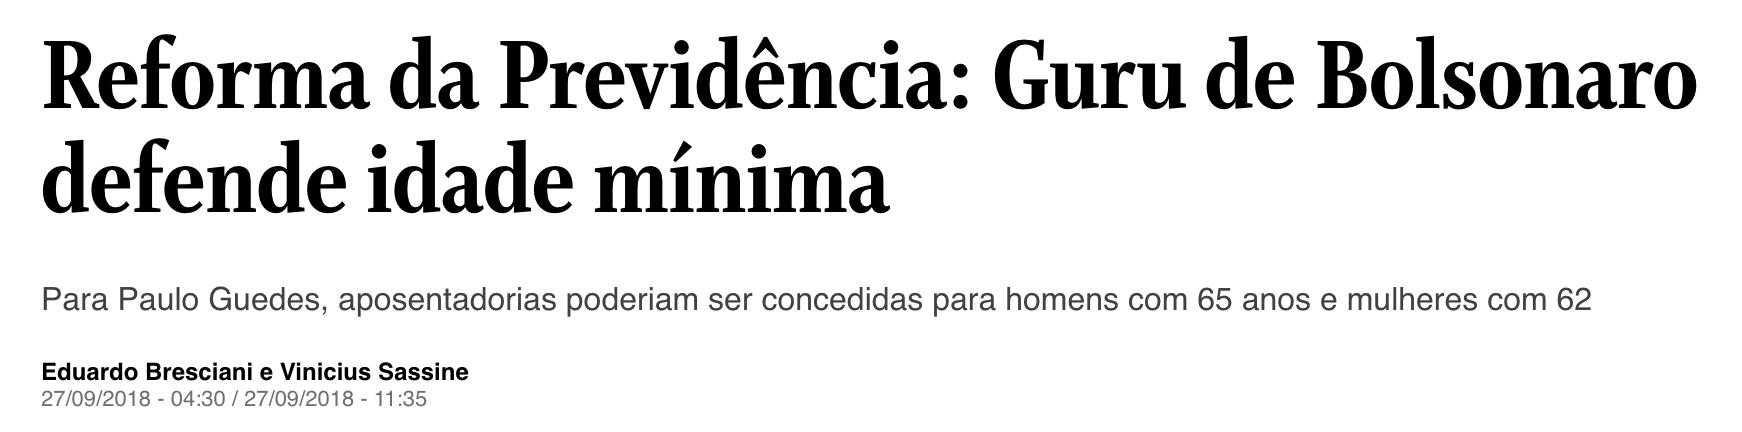 O Globo/Reprodução, https://oglobo.globo.com/brasil/reforma-da-previdencia-guru-de-bolsonaro-defende-idade-minima-23105583